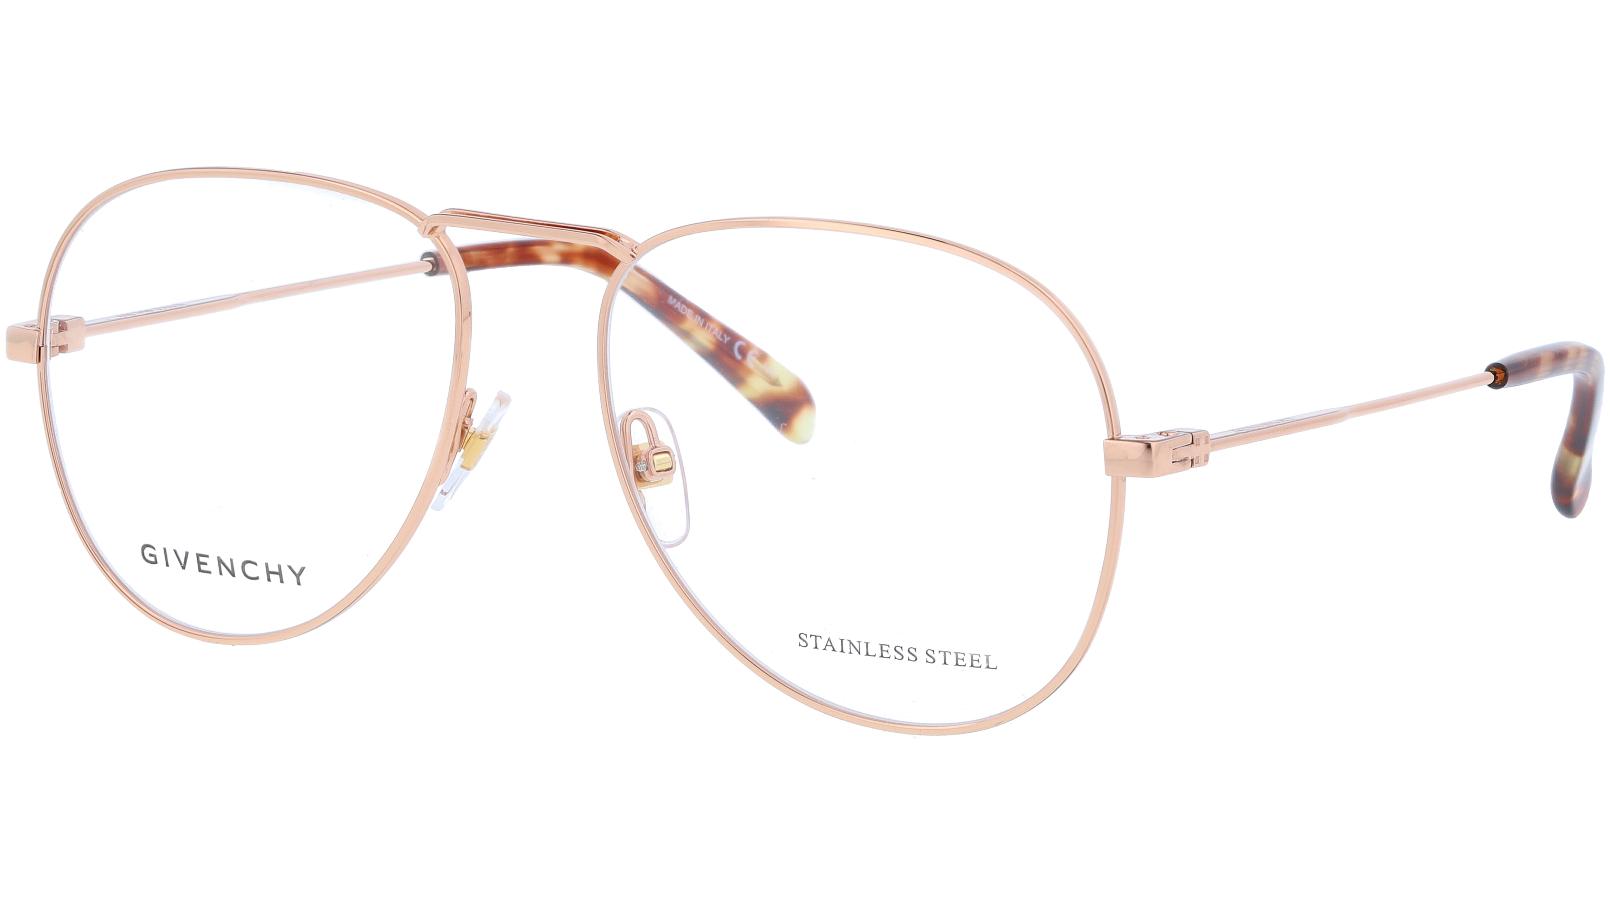 Givenchy GV0117 DDB 55 Gold Glasses